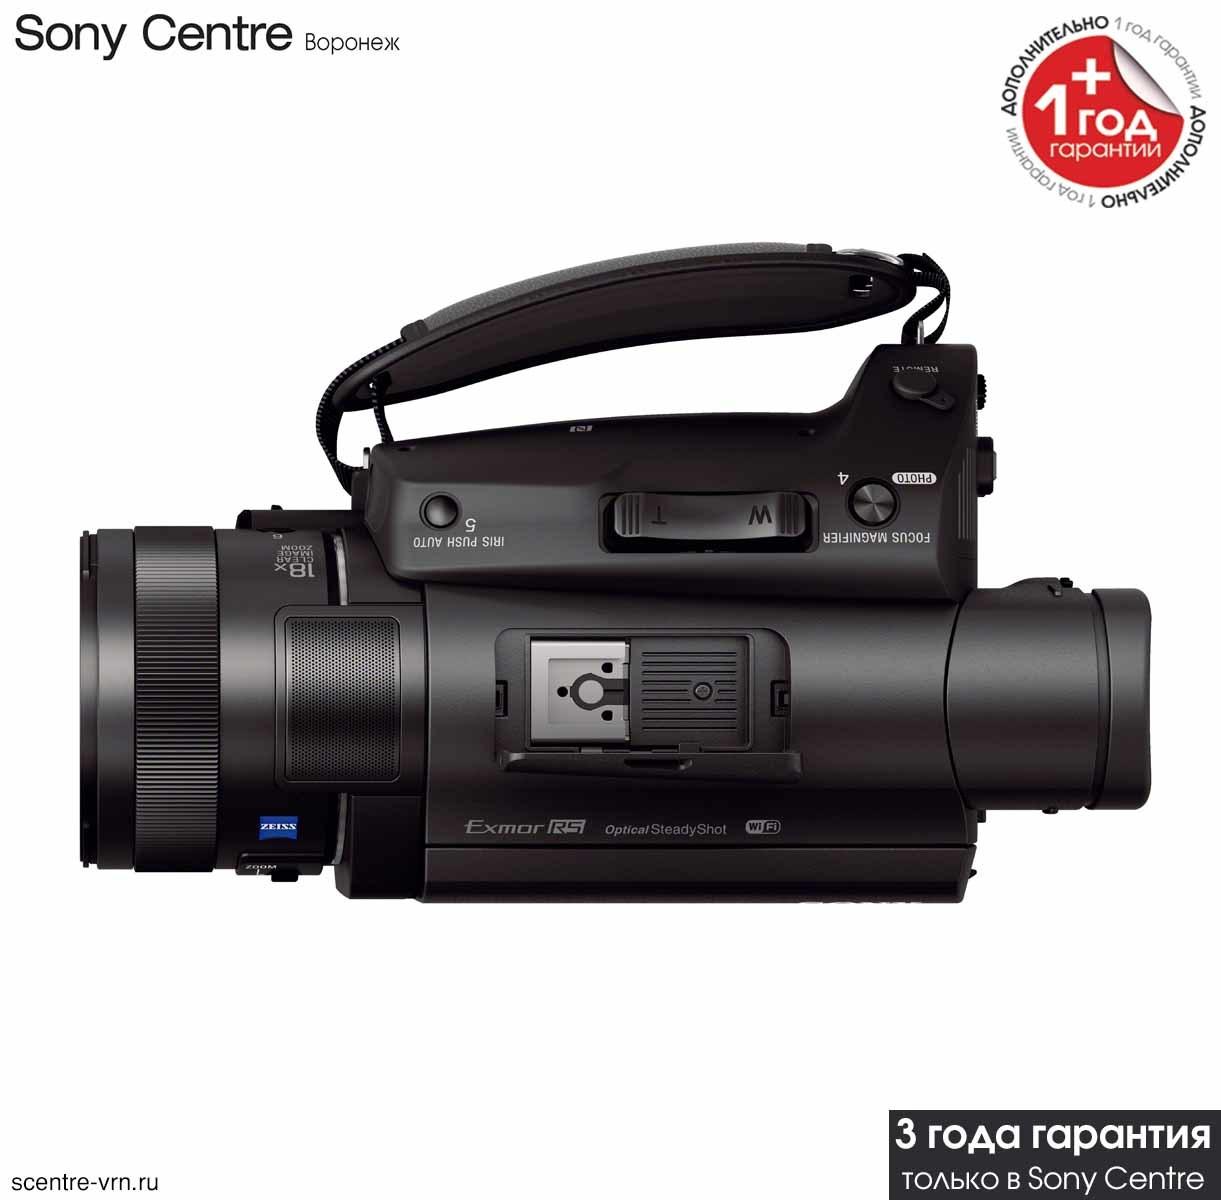 4K видеокамера Sony Handycam FDR-AX700